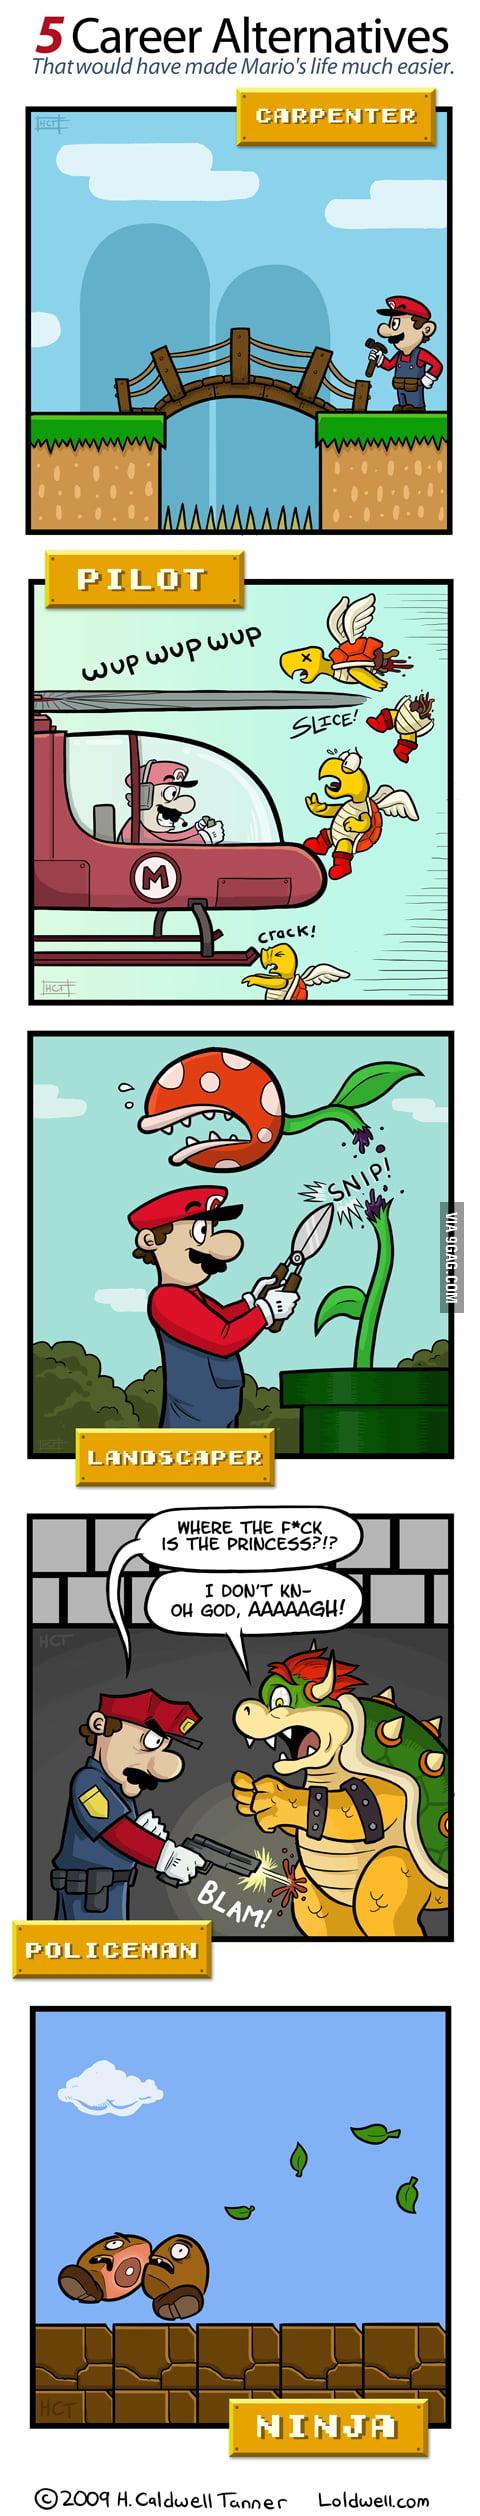 5 Career Alternatives for Mario